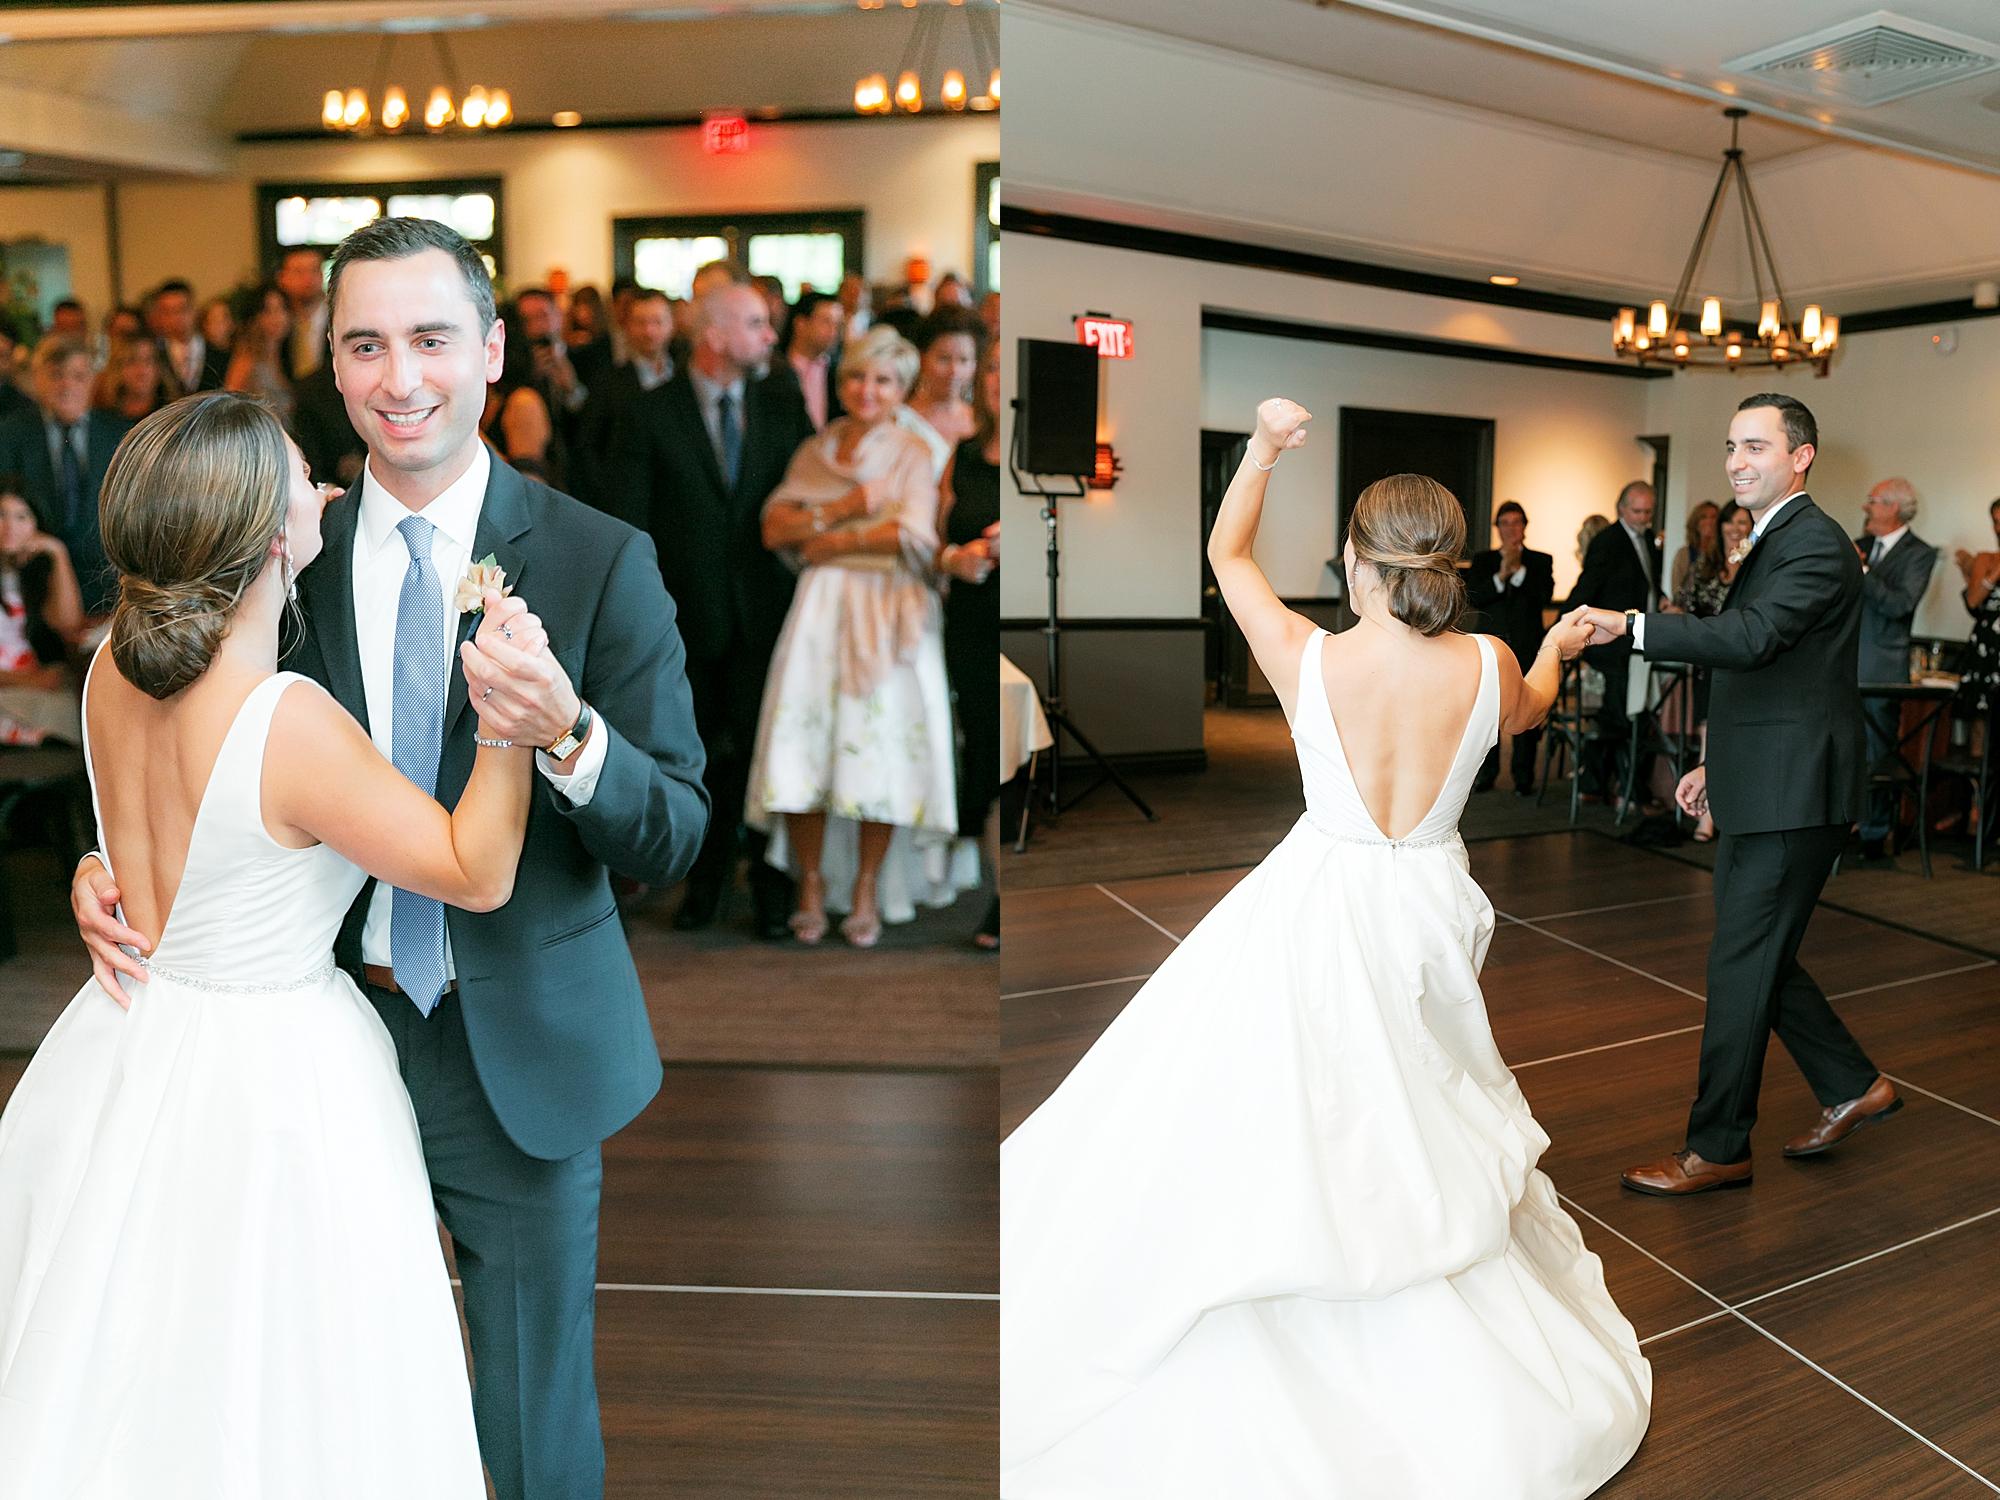 Princeton New Jersey Film Wedding Photographer Princeton University Wedding Photography by Magdalena Studios NJ Wedding Photographer59